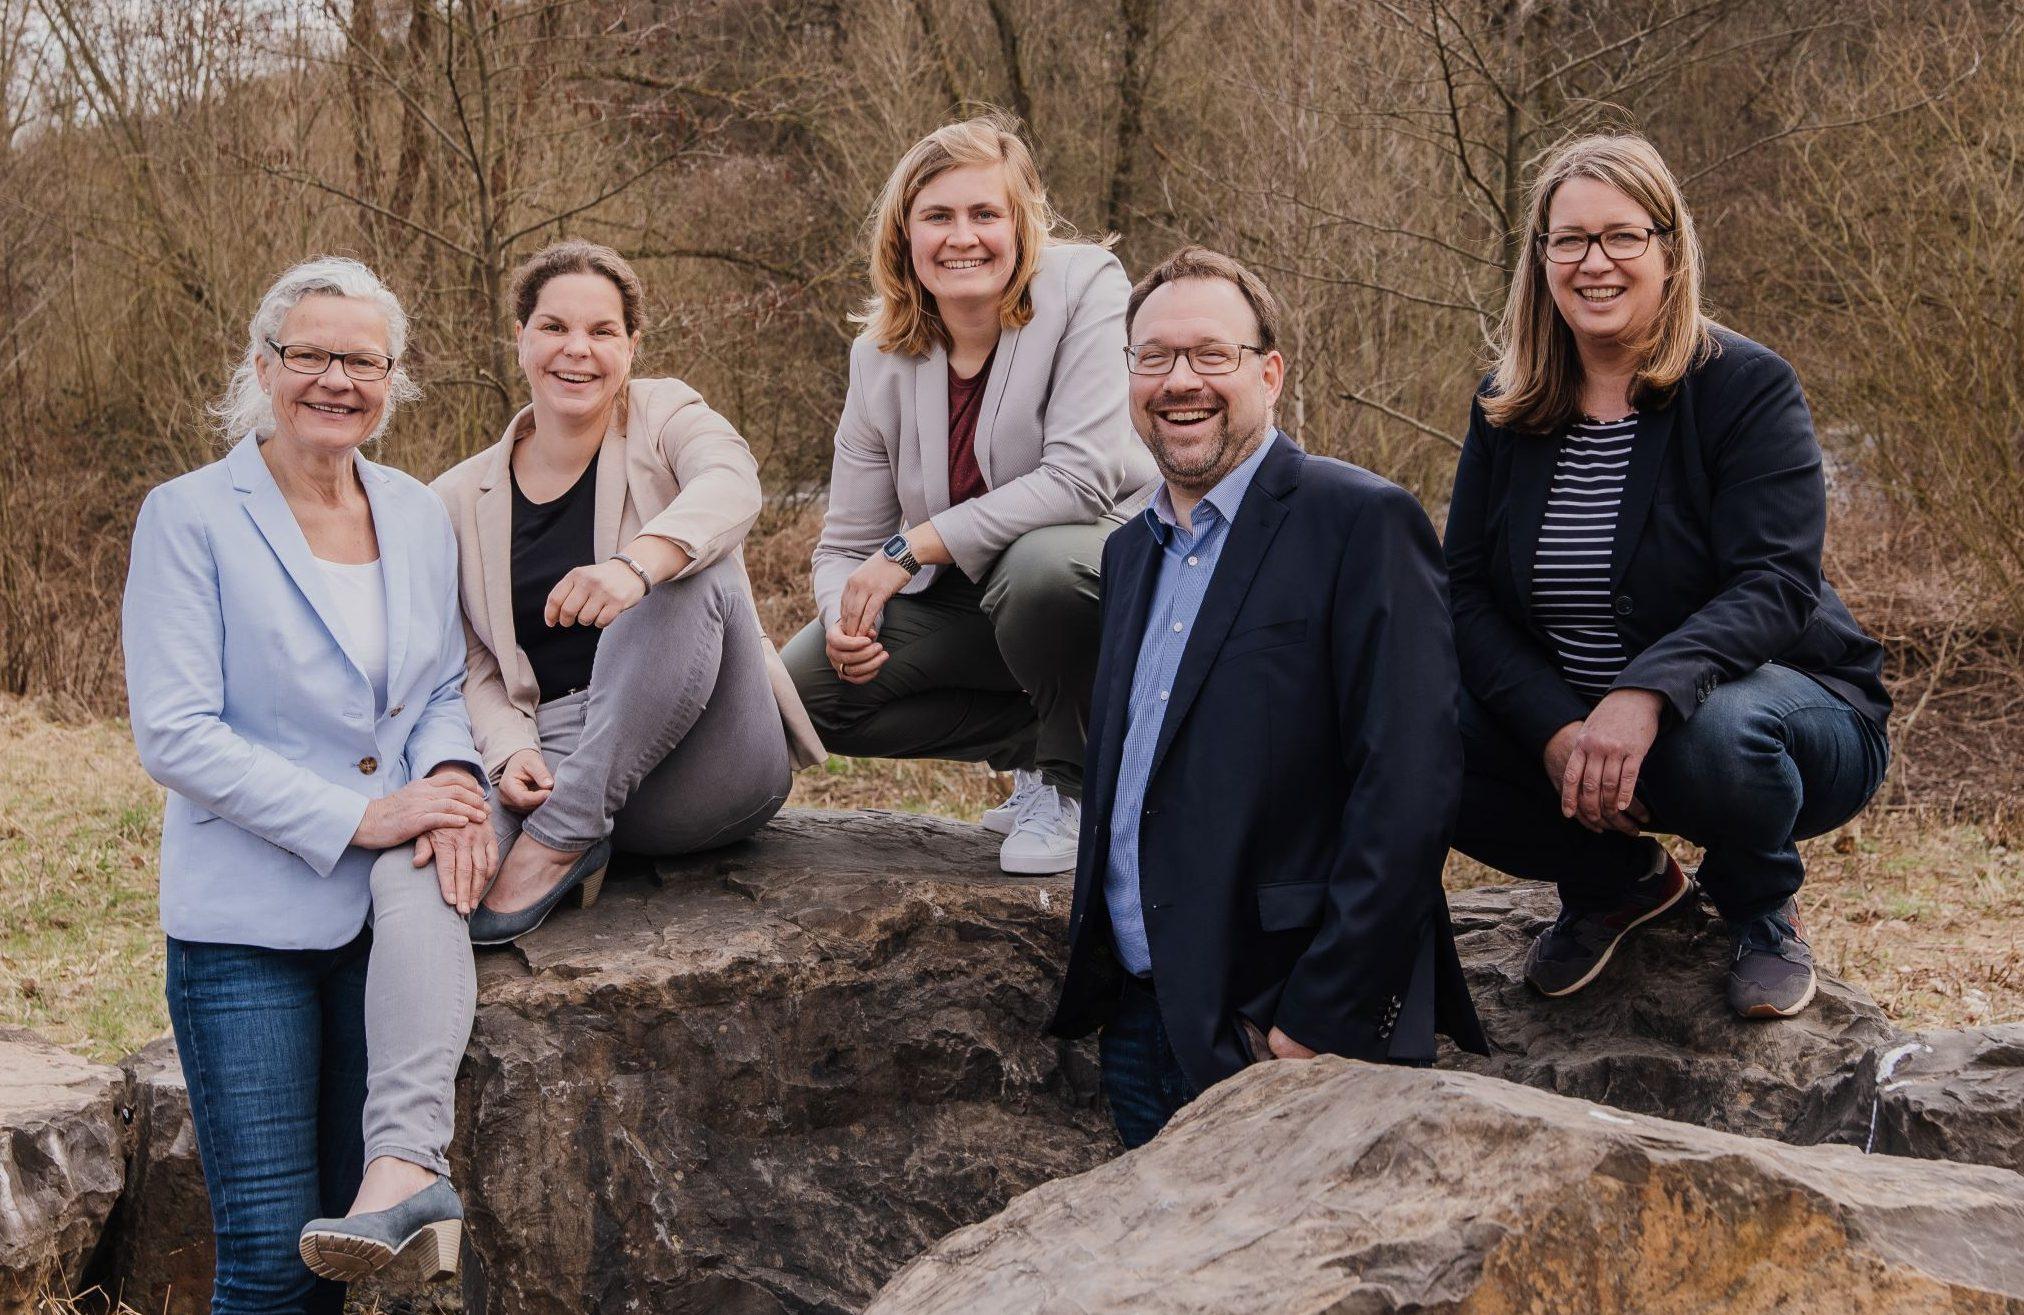 Silvia Kaufhold, Katharina Kaufhold, Anna Frieler, Maximilian Burchardt, Anja Burchardt